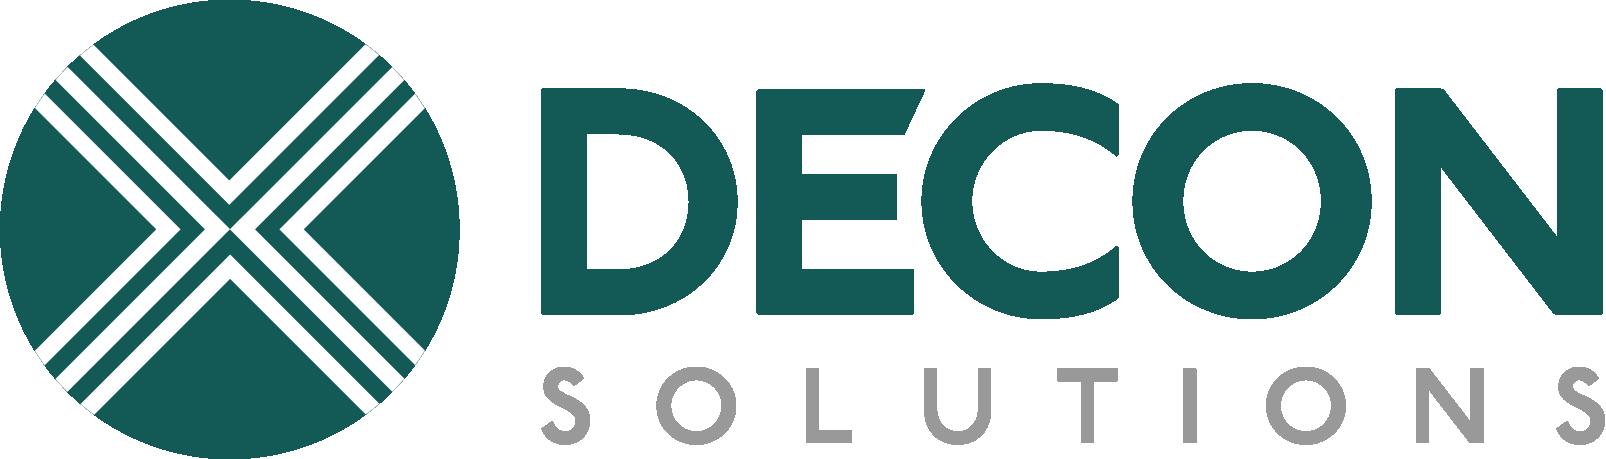 DECON SOLUTIONS CO.,LTD